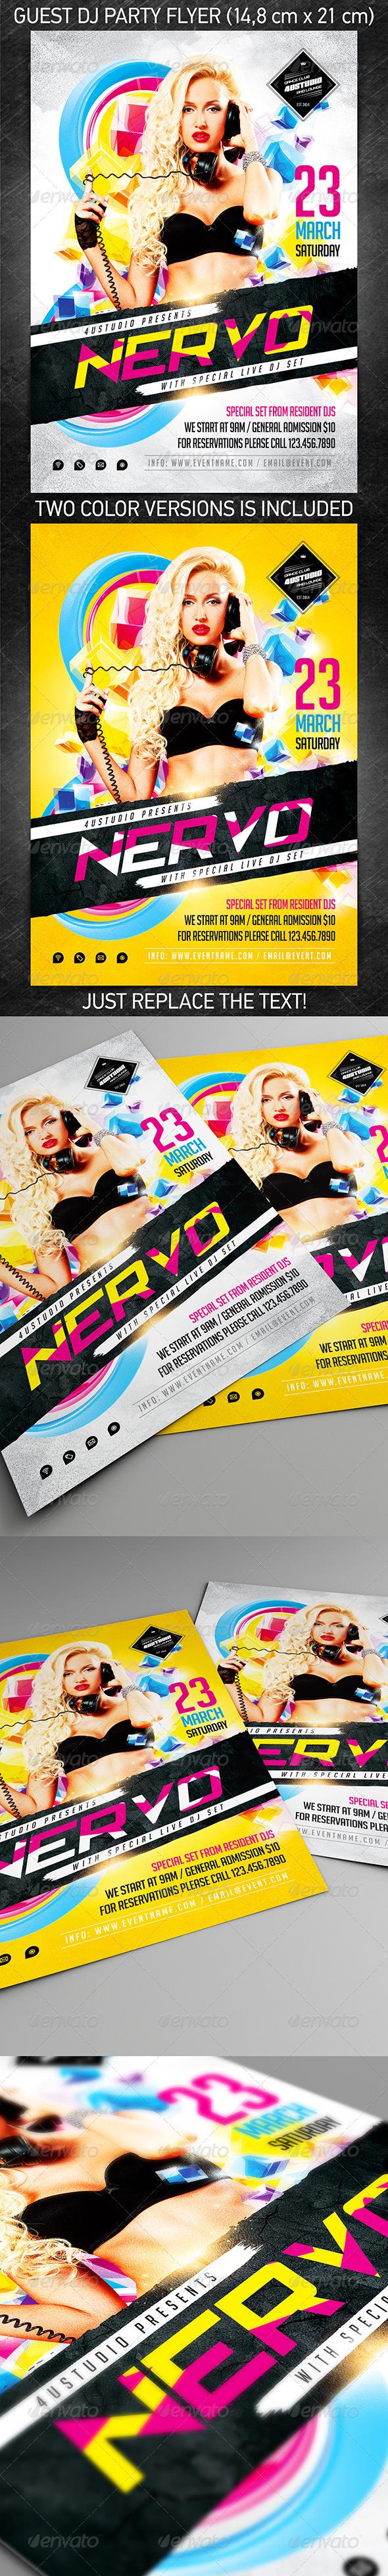 Guest DJ party flyer vol3, PSD Template